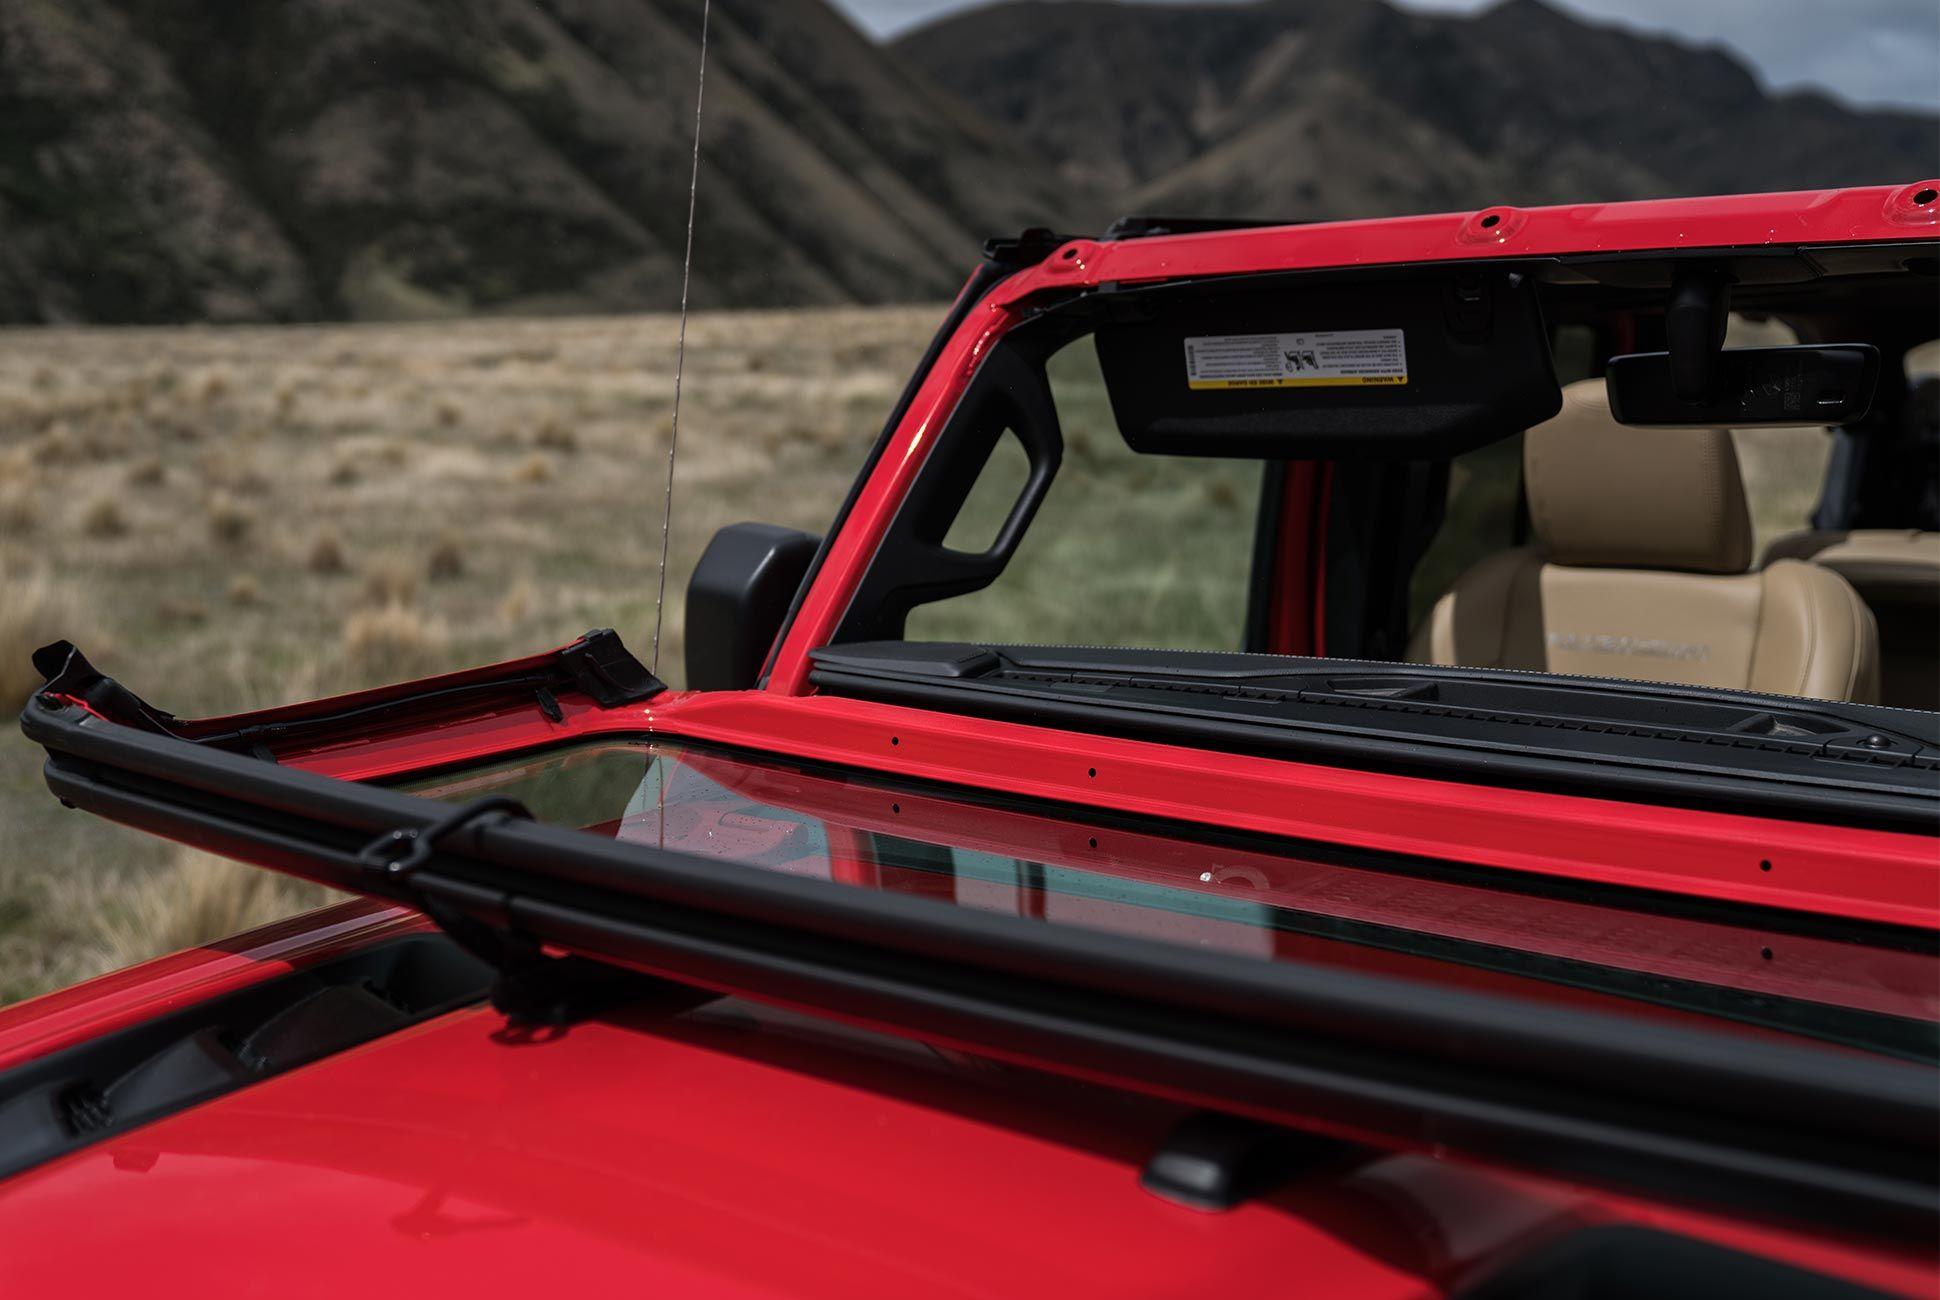 2018-Jeep-Wrangler-Review-gear-patrol-11